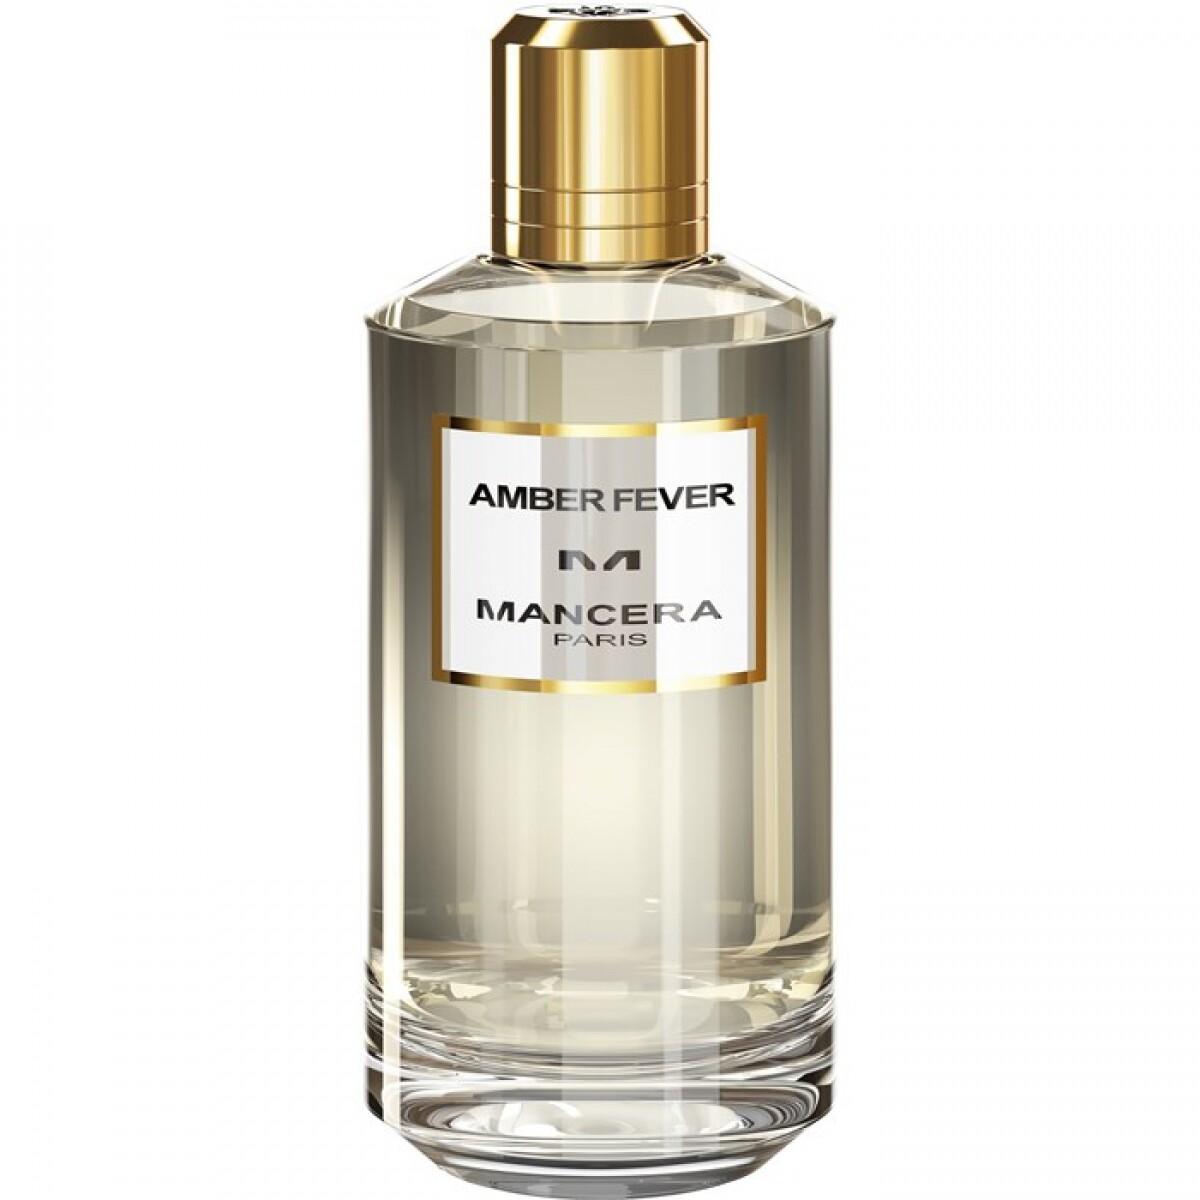 Mancera | Amber Fever 60ml | Parfum |10631 diversen